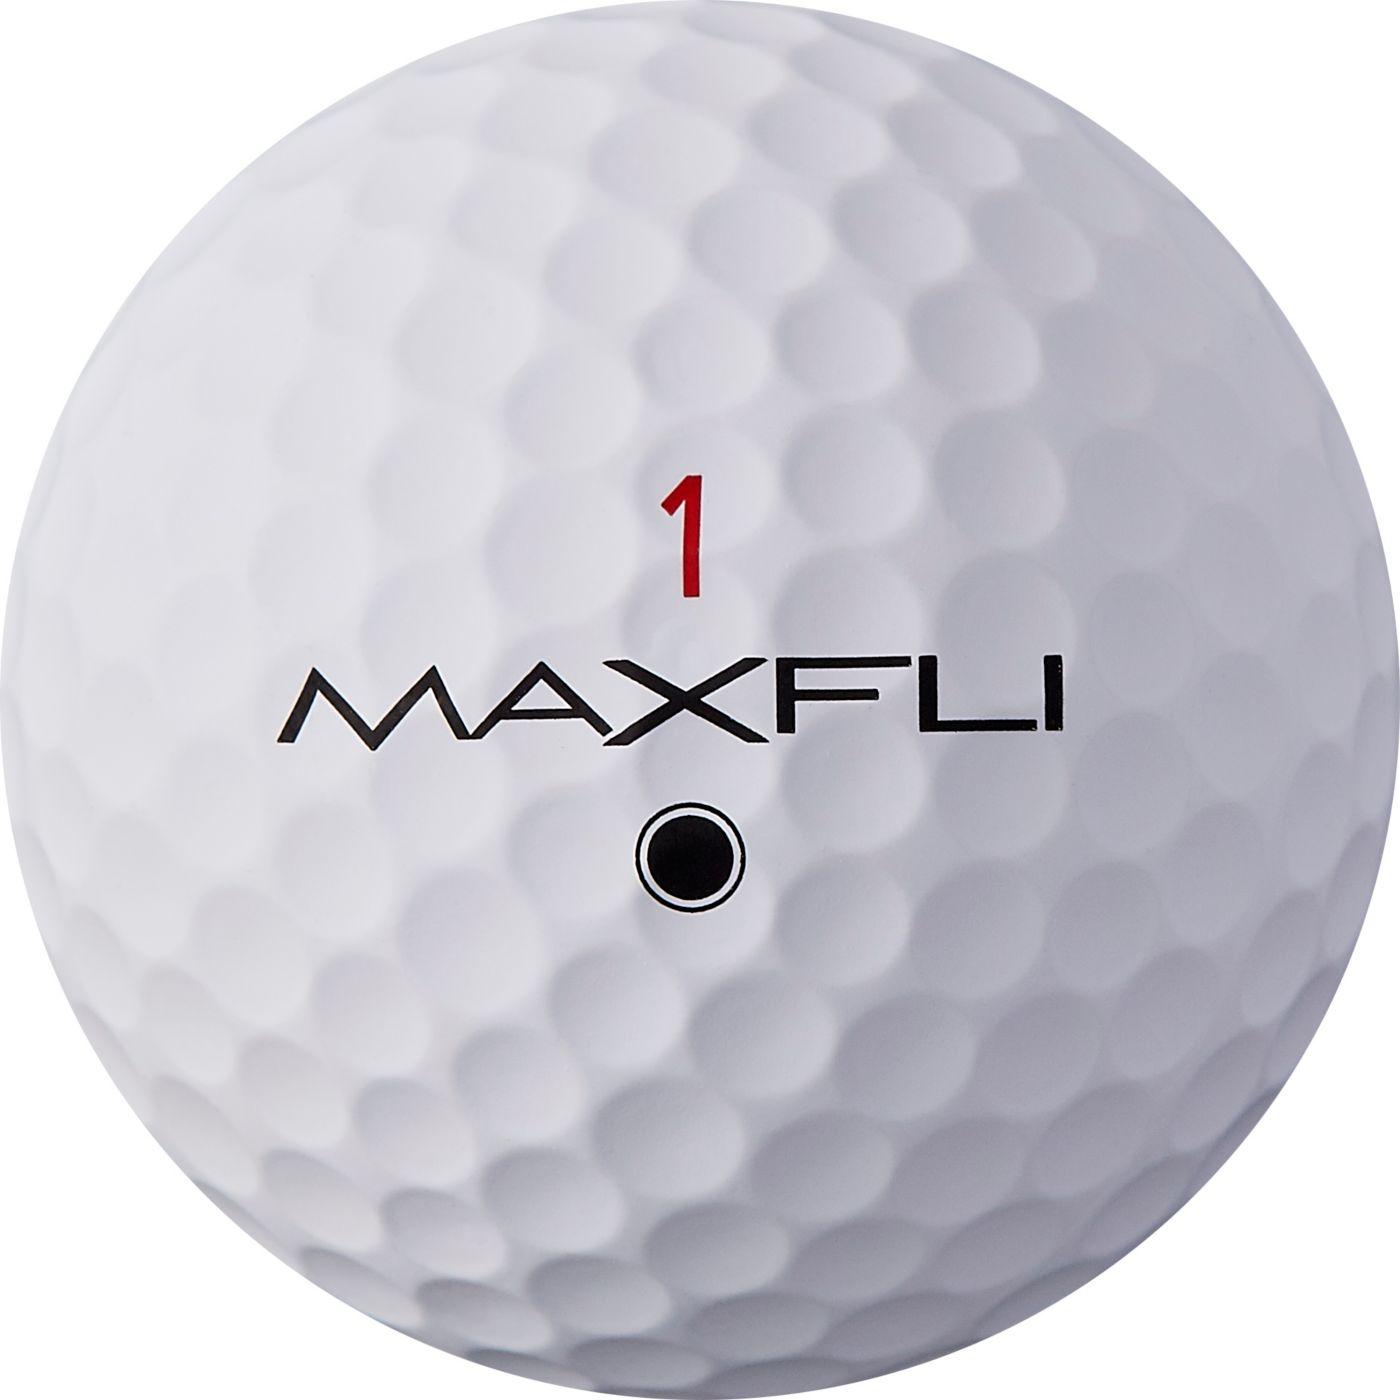 Maxfli 2019 Tour X Matte White Personalized Golf Balls